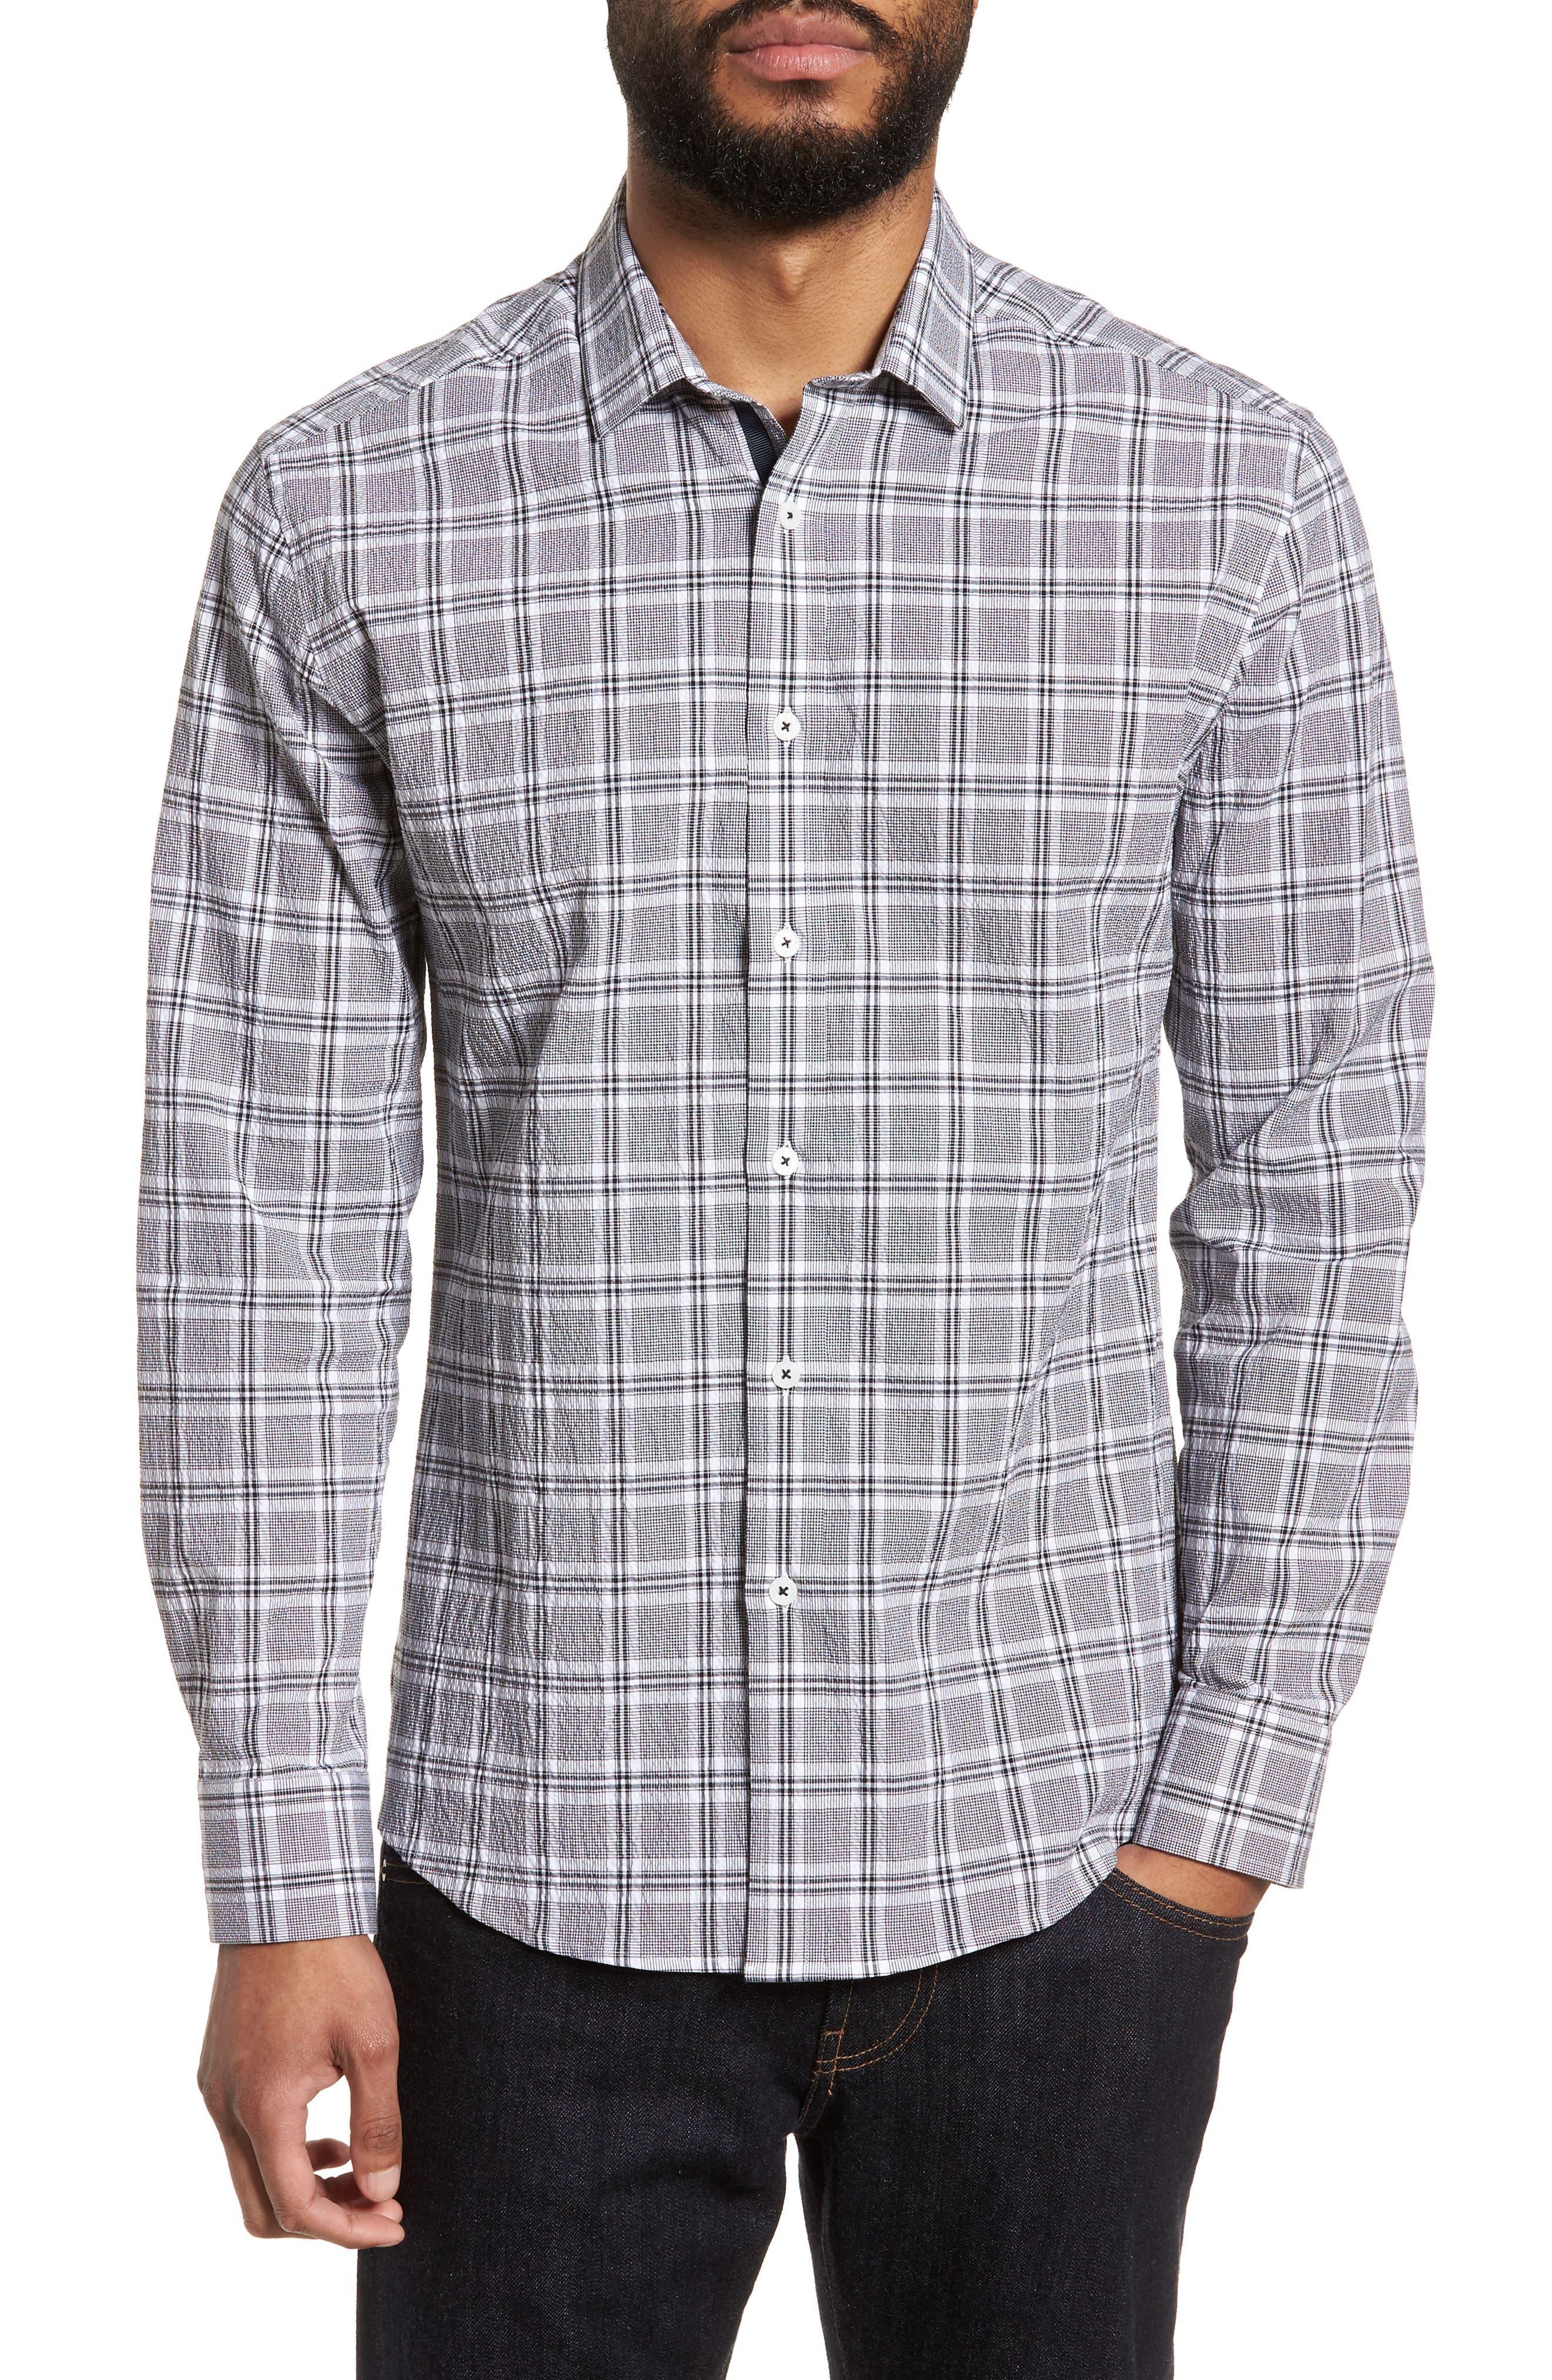 Alternate Image 1 Selected - Vince Camuto Slim Fit Plaid Seersucker Sport Shirt